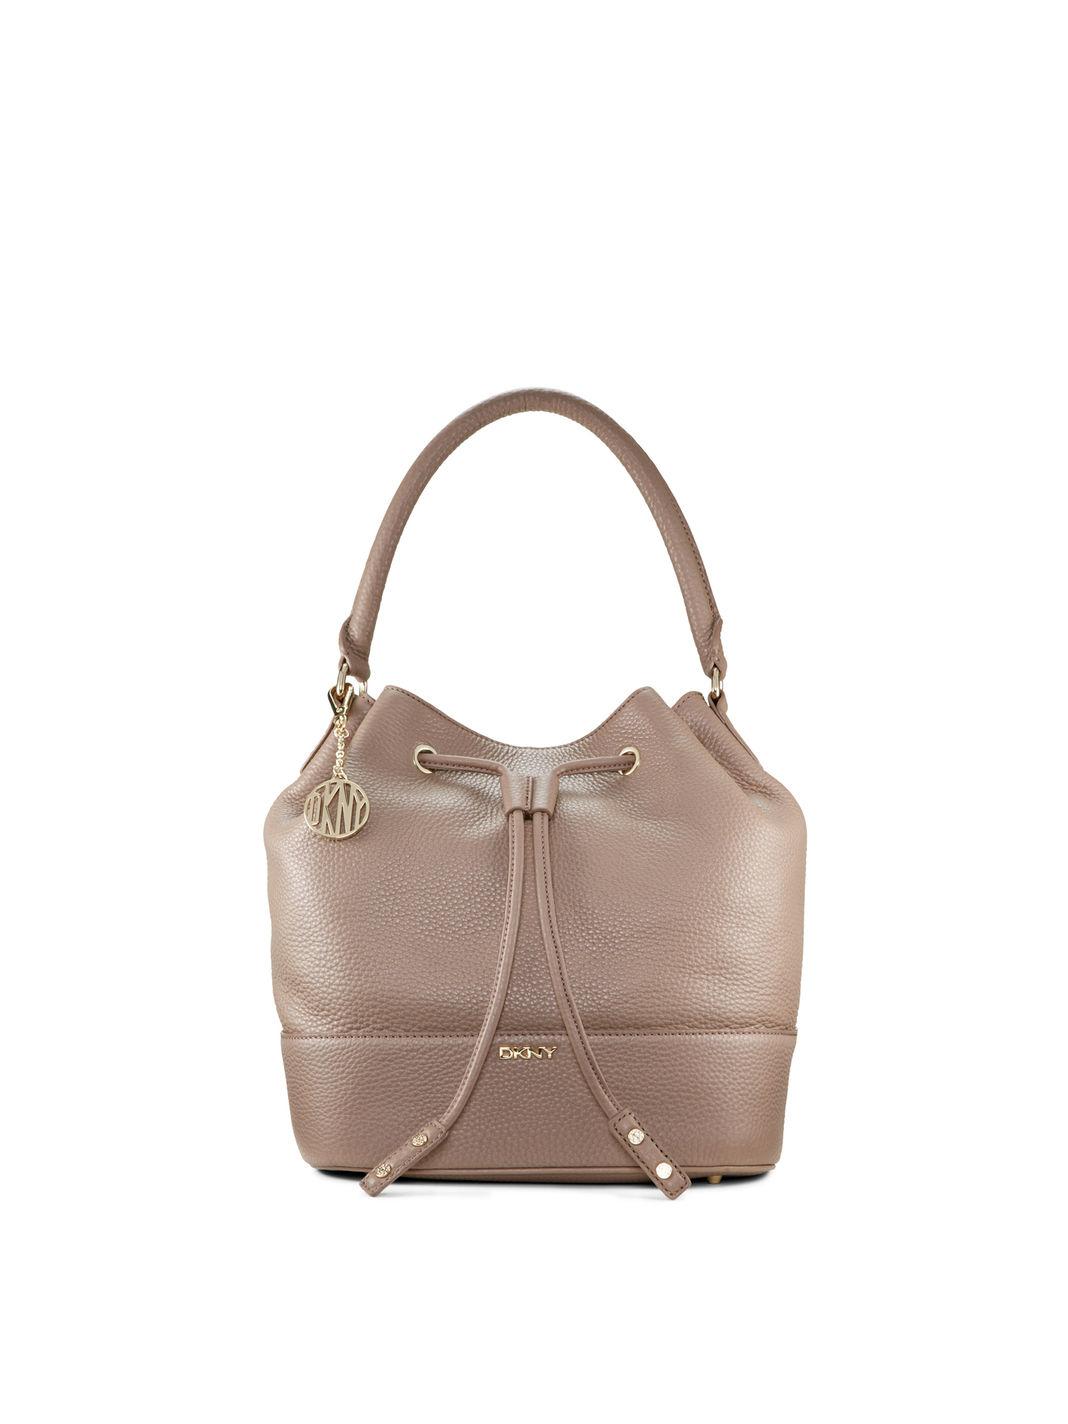 Dkny Soft Leather Handbags Handbags 2018